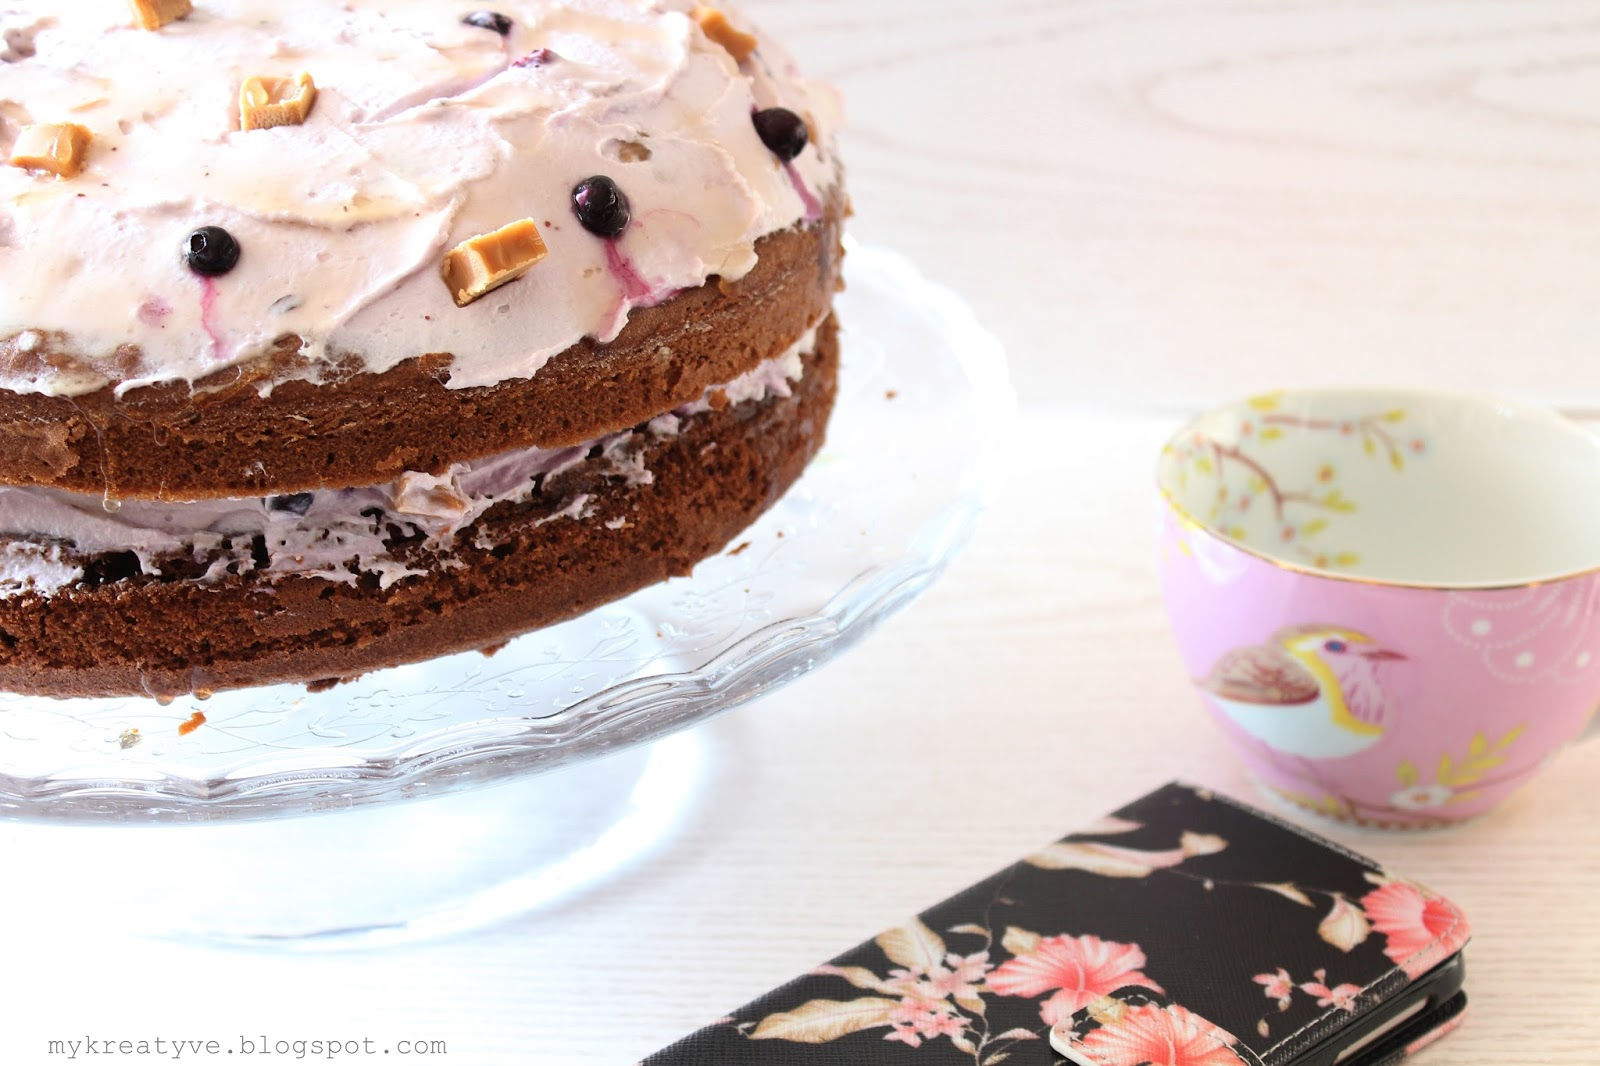 kreatyve meine liebsten rezepte leckere karamell schoko torte. Black Bedroom Furniture Sets. Home Design Ideas